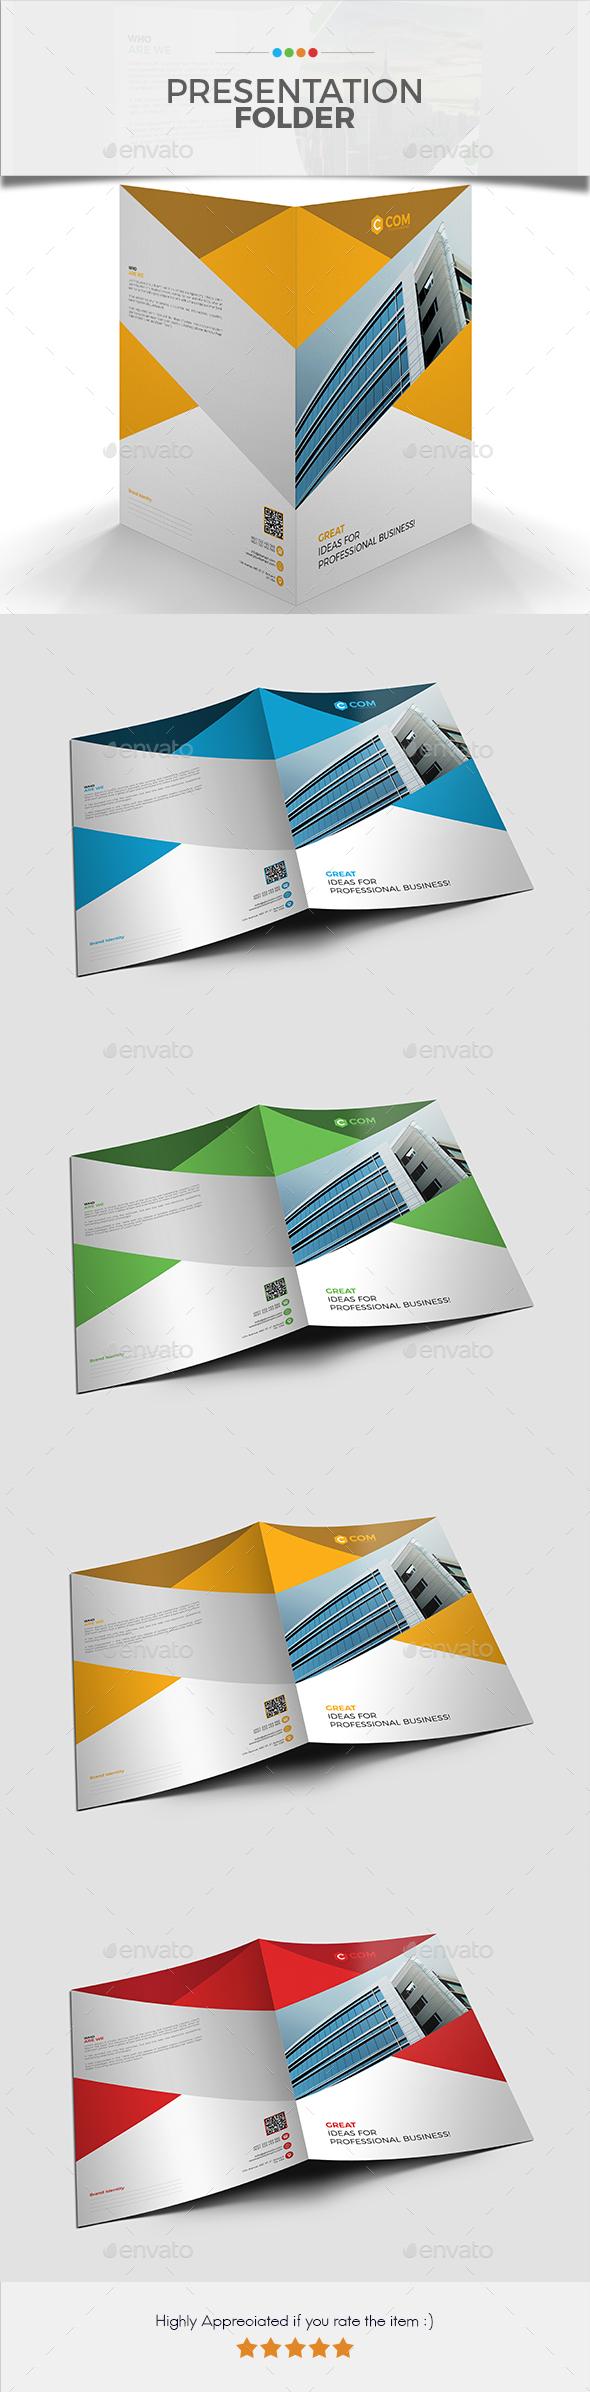 Presentation Folder 03 - Stationery Print Templates